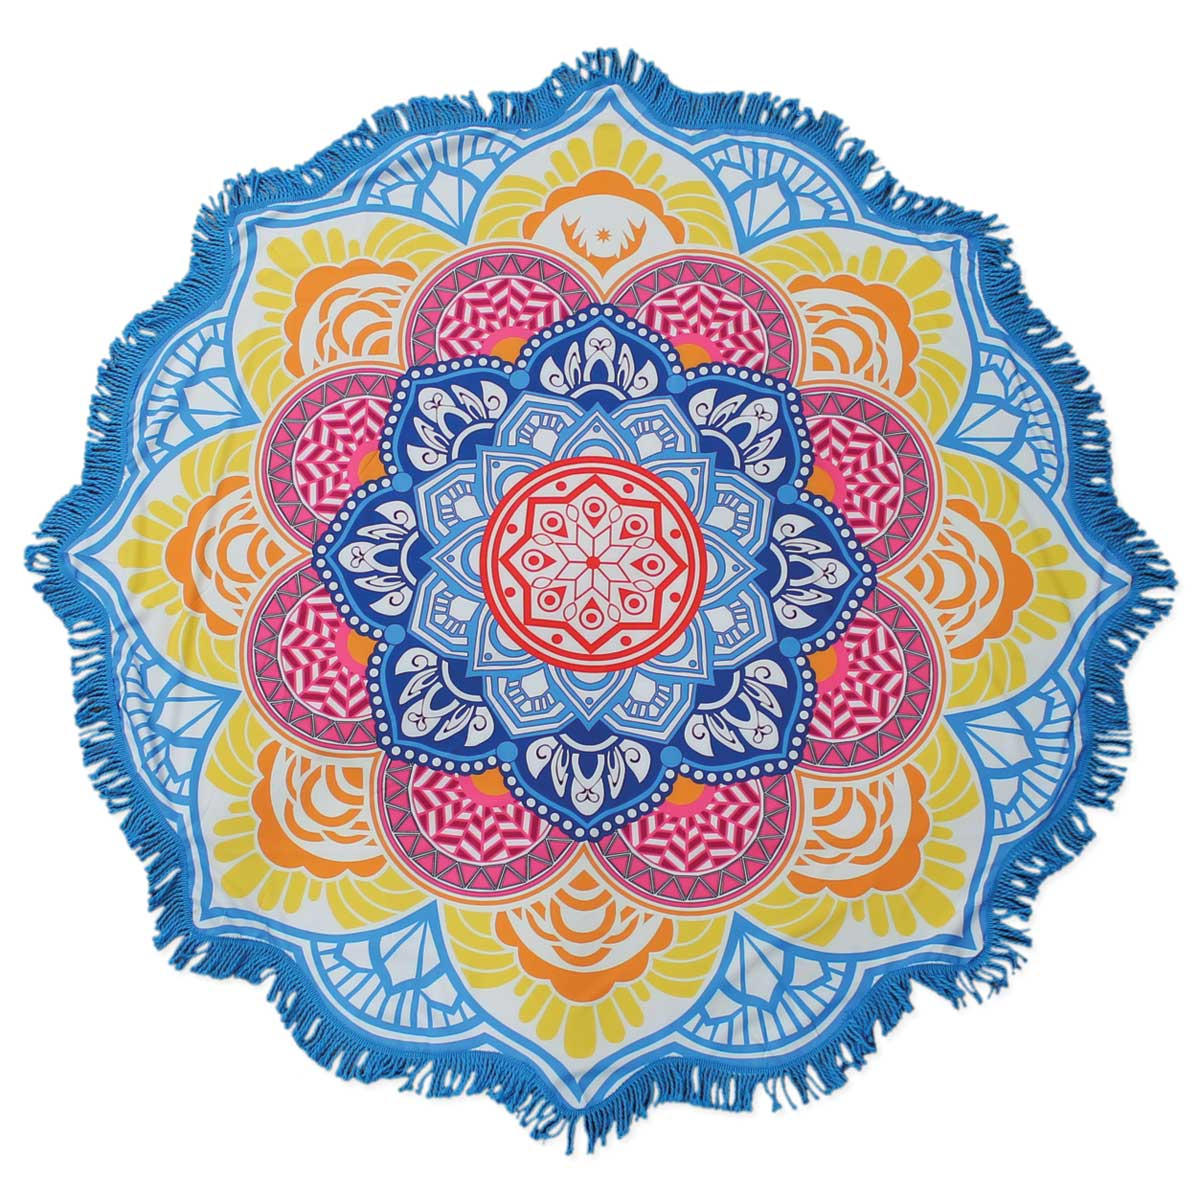 Turquoise Fringe Rounded Flower Blanket